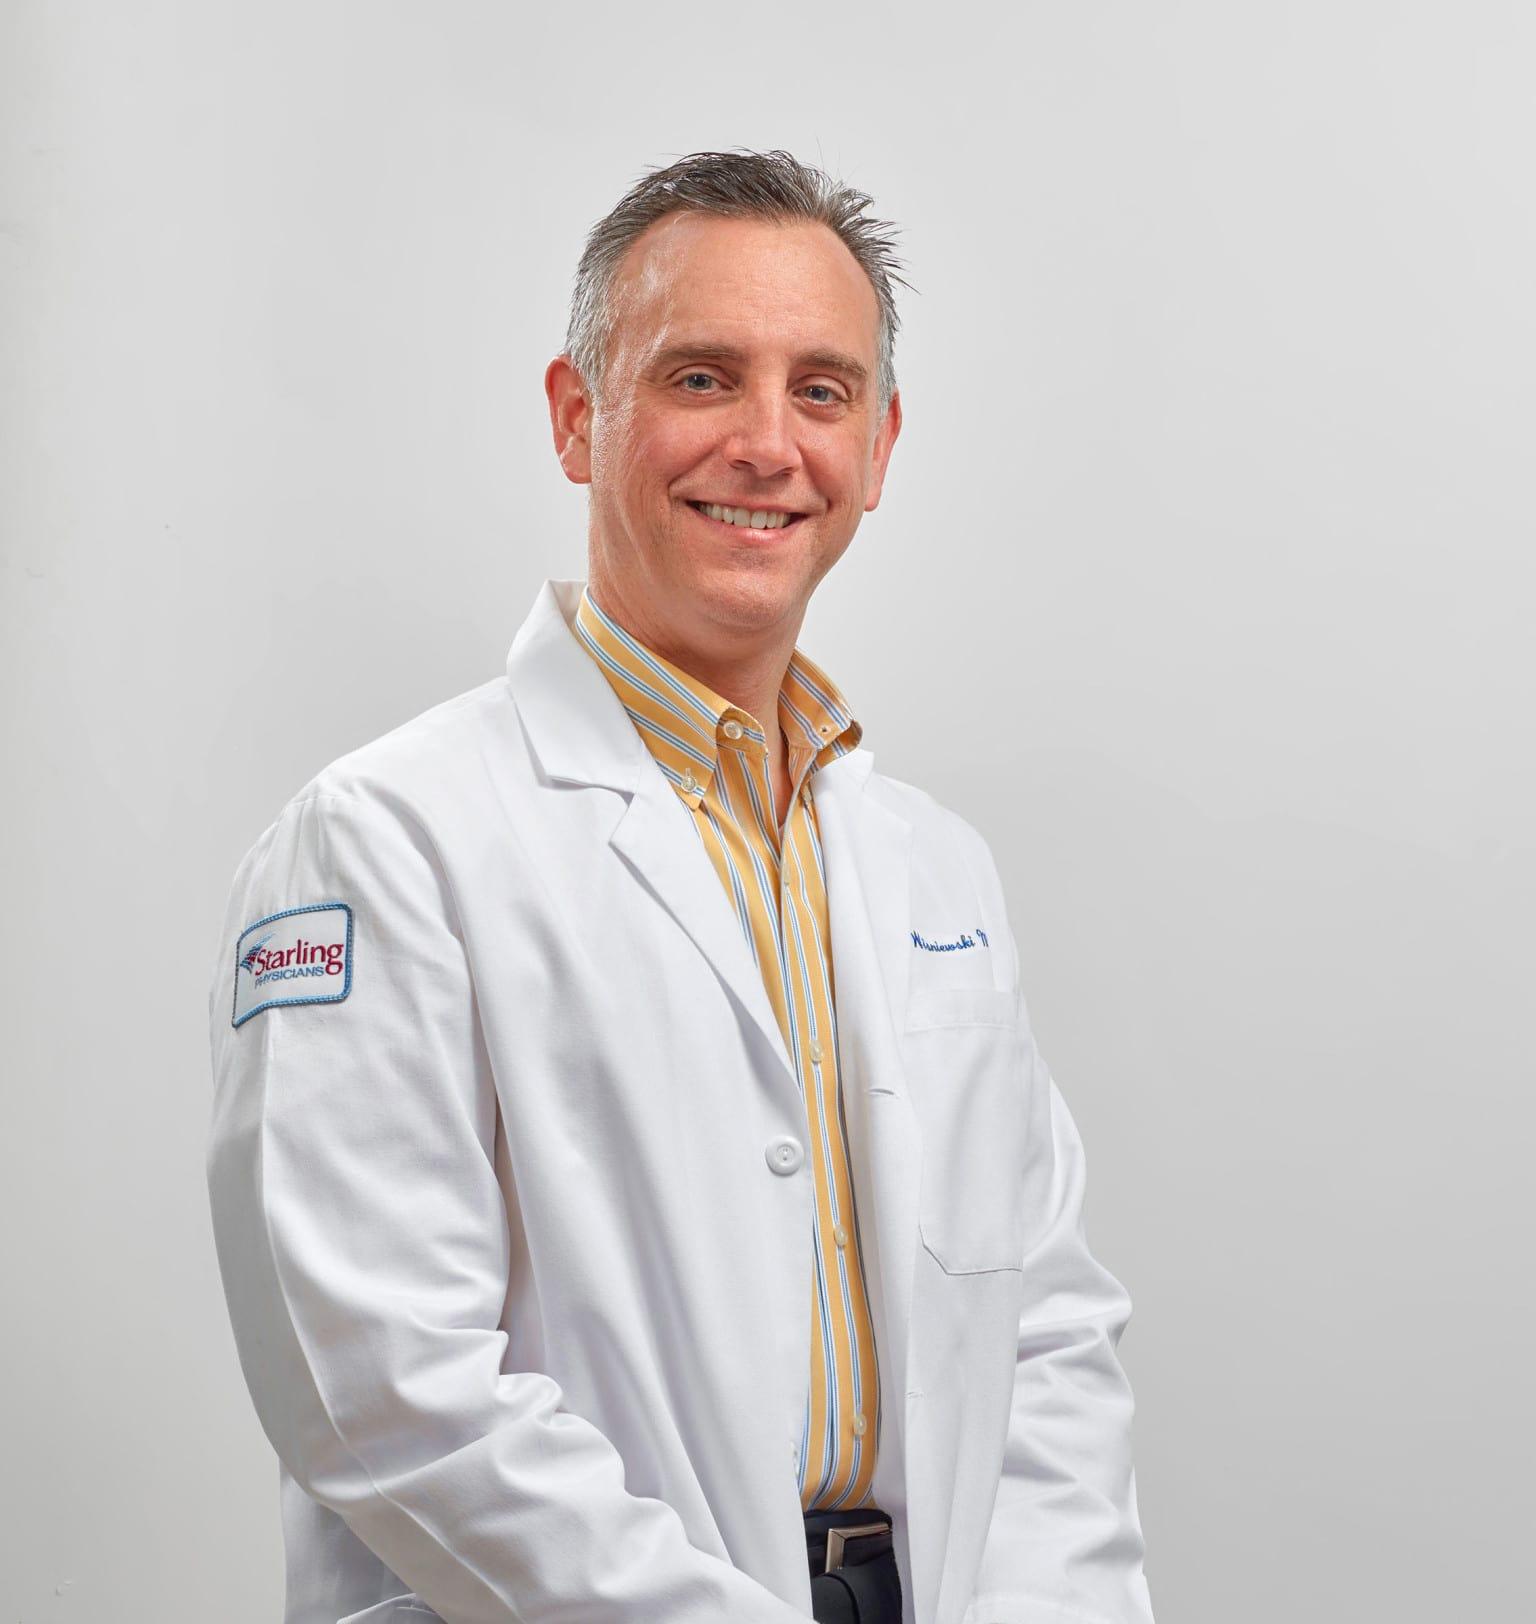 Dr. John S Wisniewski MD